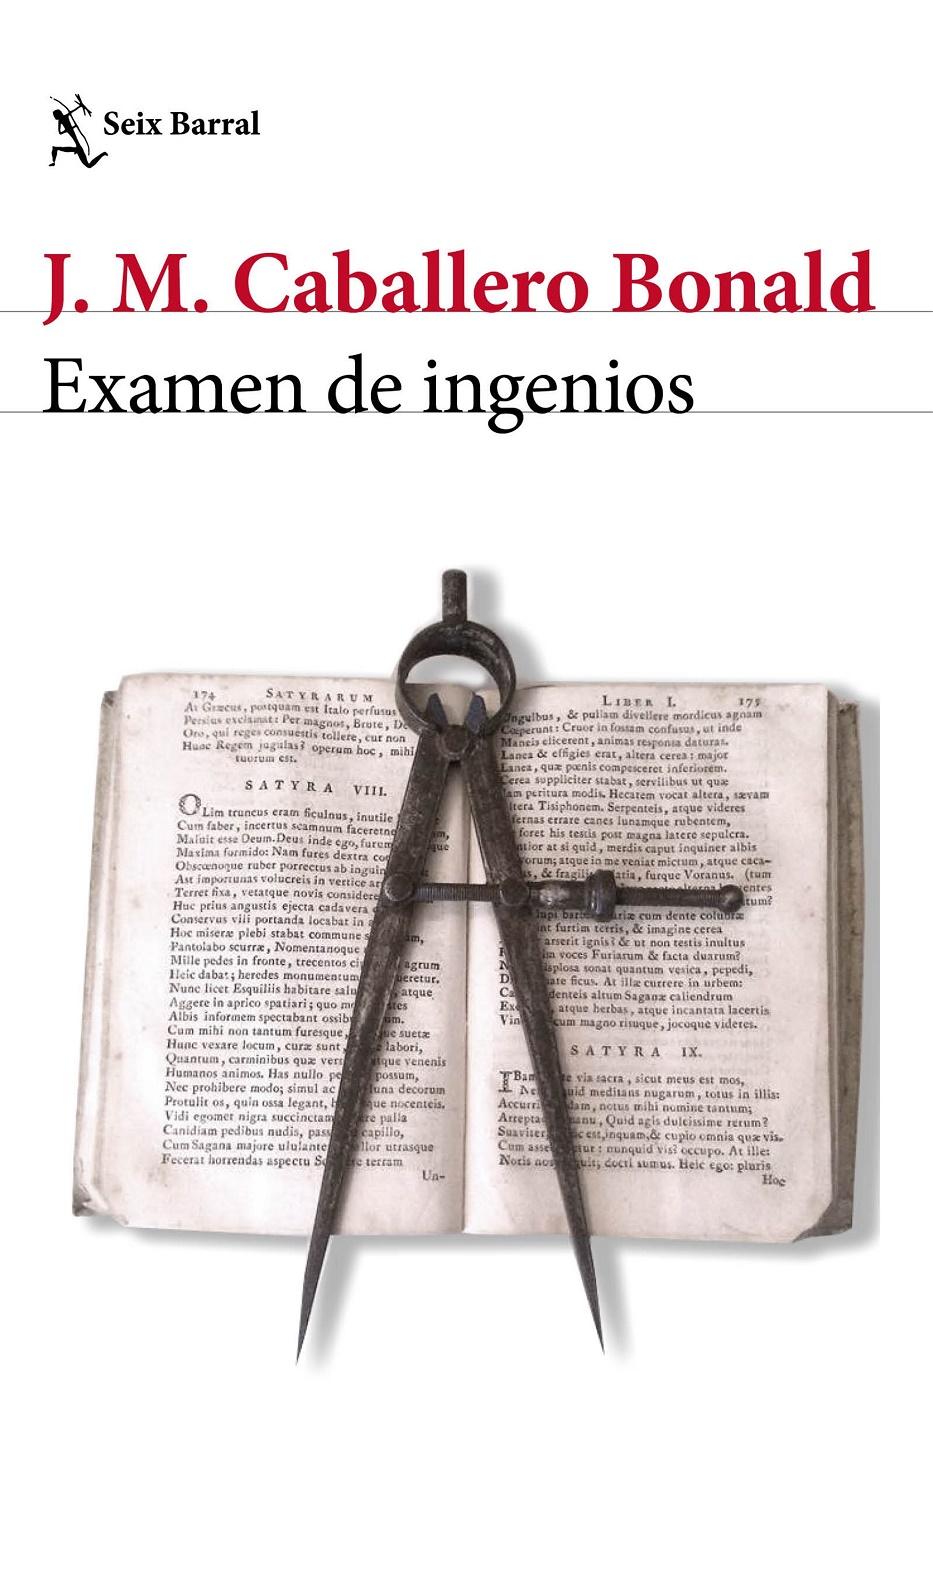 https://laantiguabiblos.blogspot.com.es/2017/05/examen-de-ingenios-j-m-caballero-bonald.html